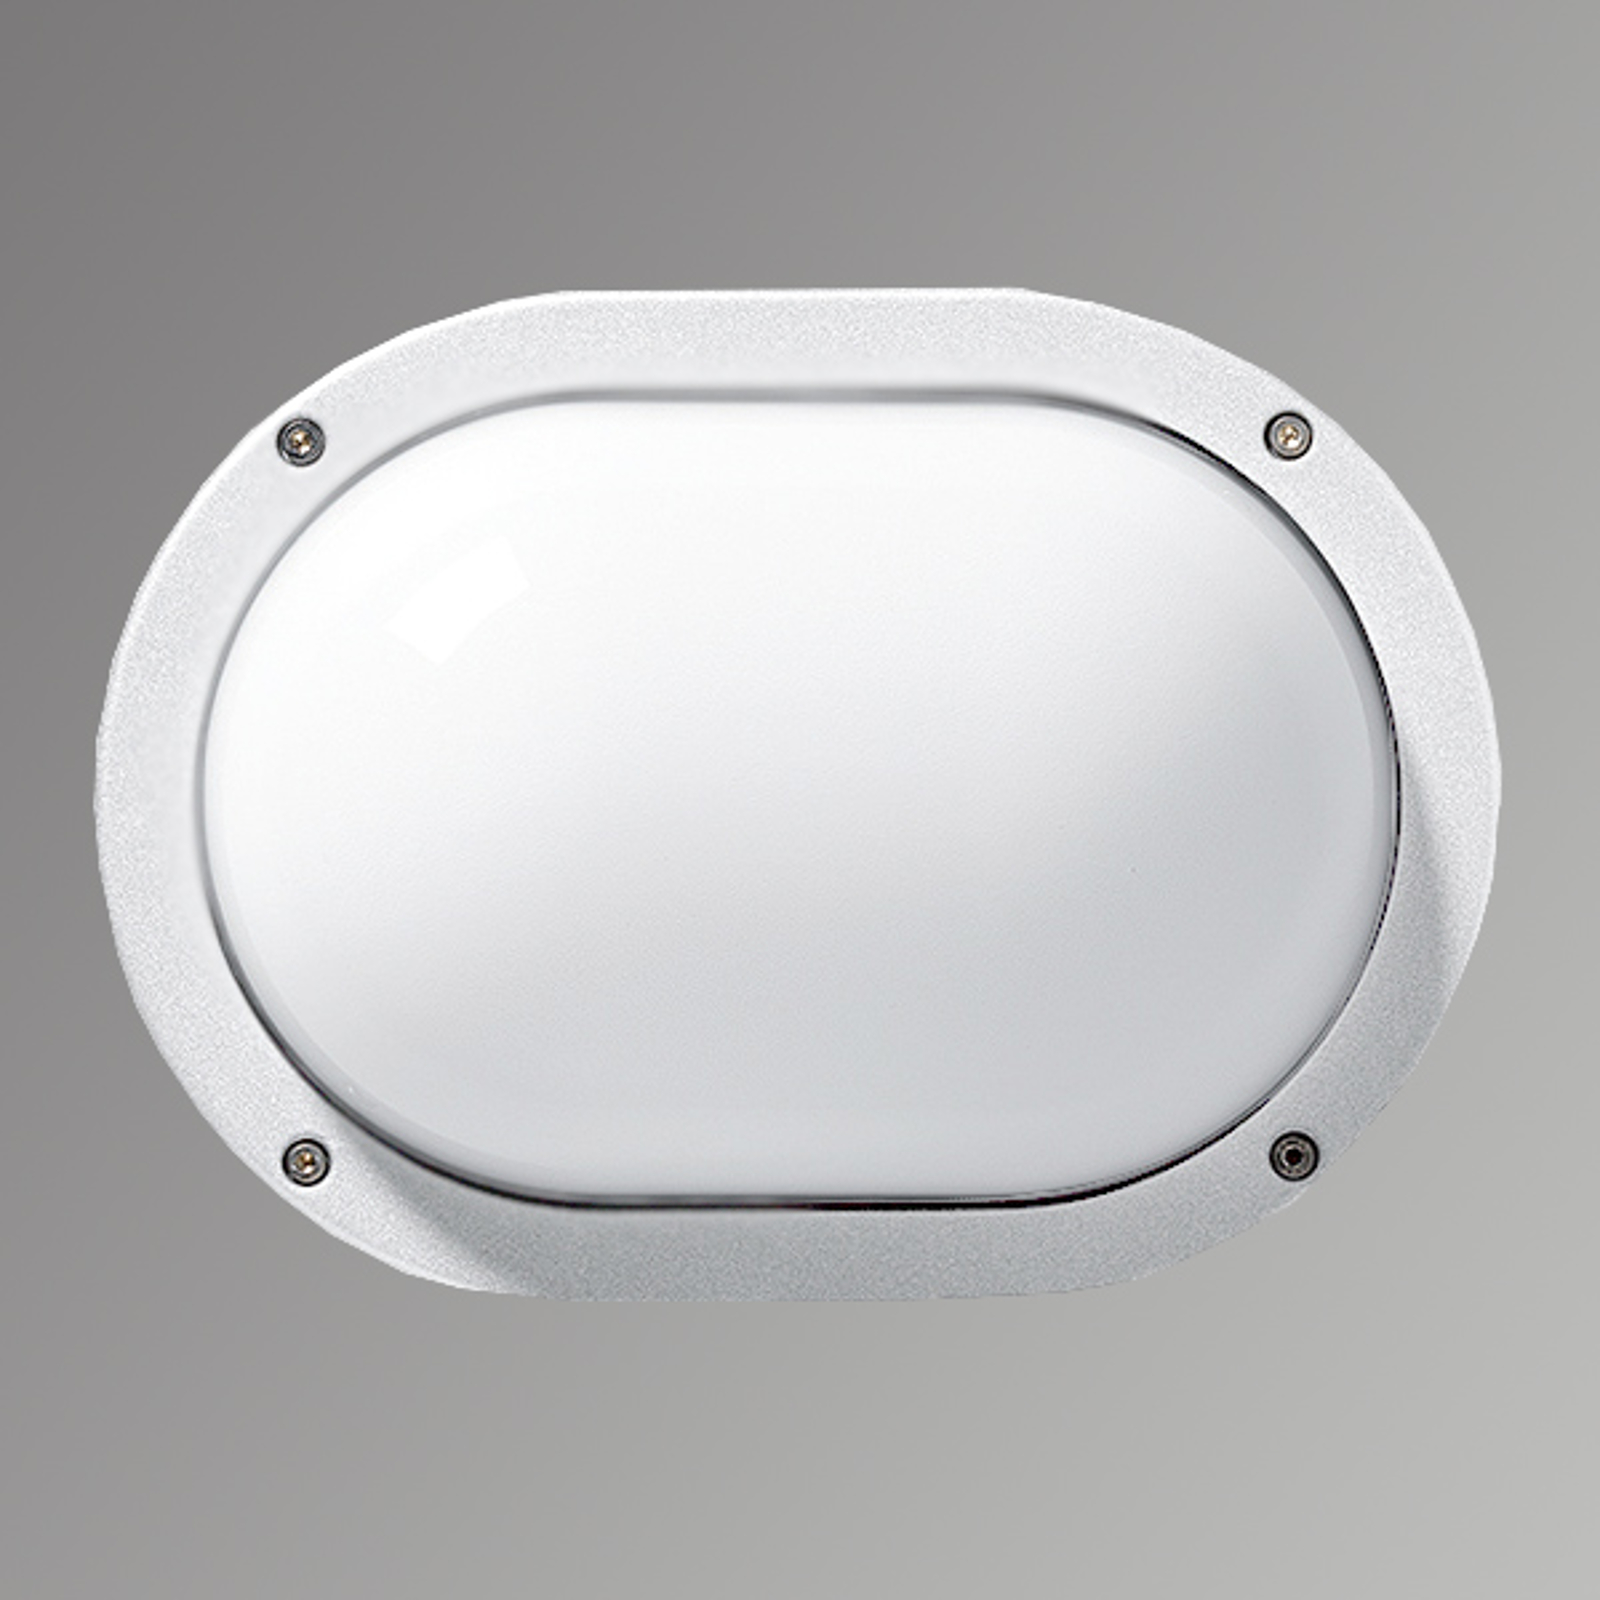 Praktische buitenwandlamp EKO, wit